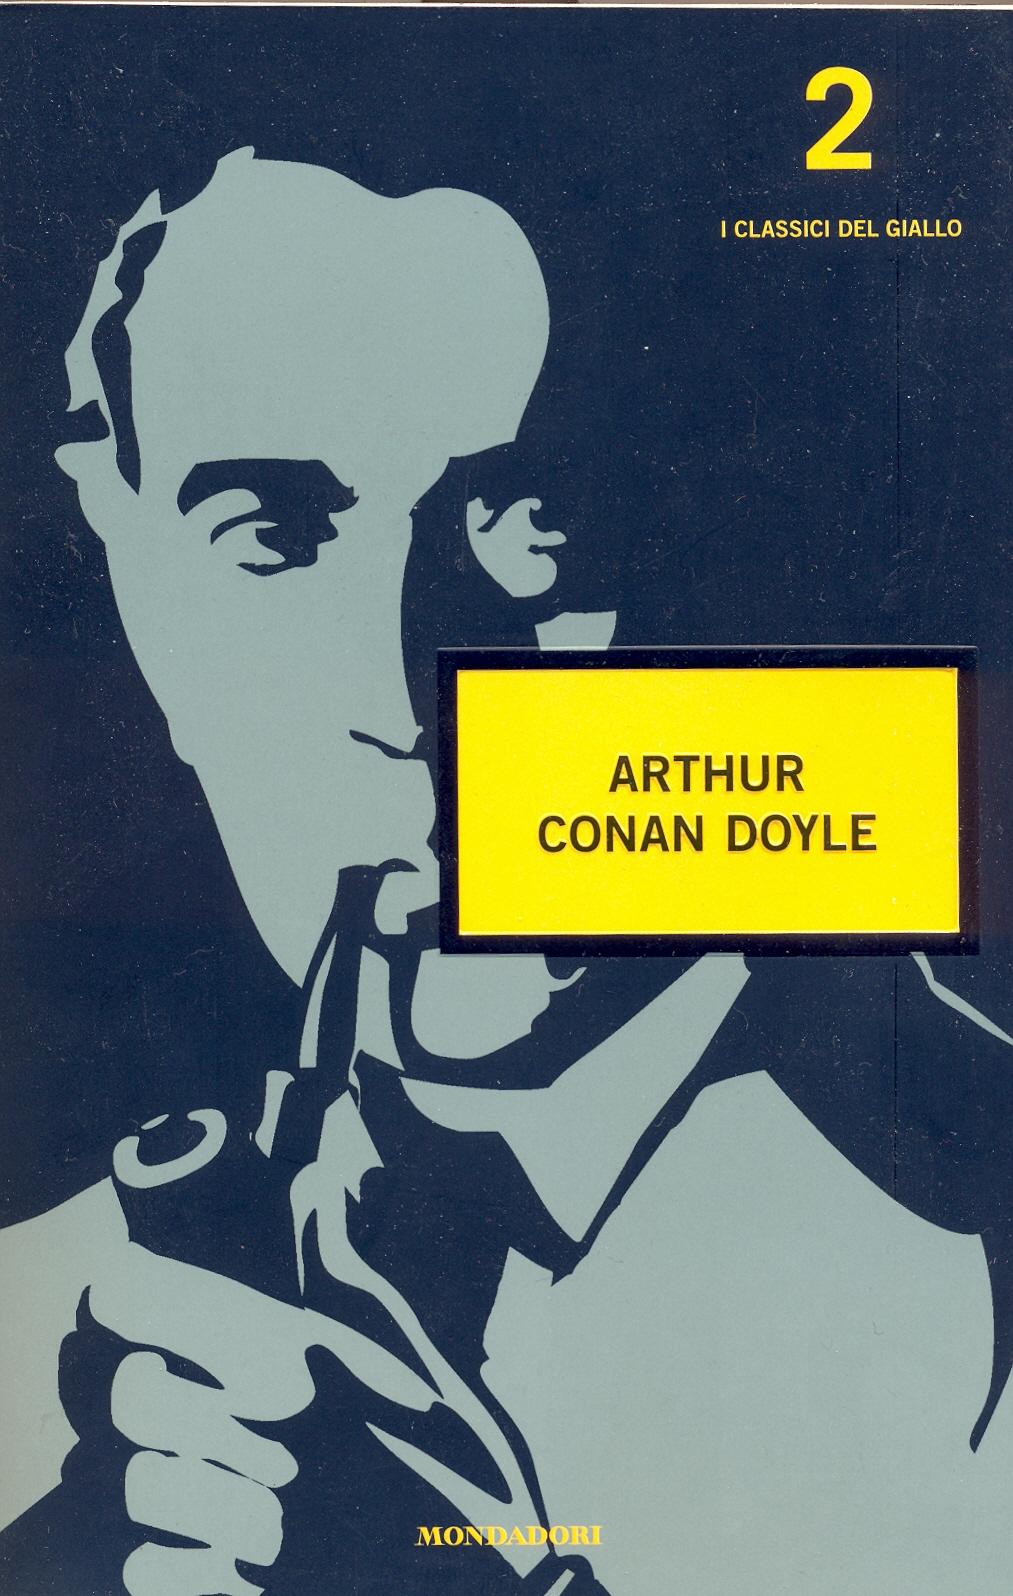 I classici del giallo 2: Arthur Conan Doyle